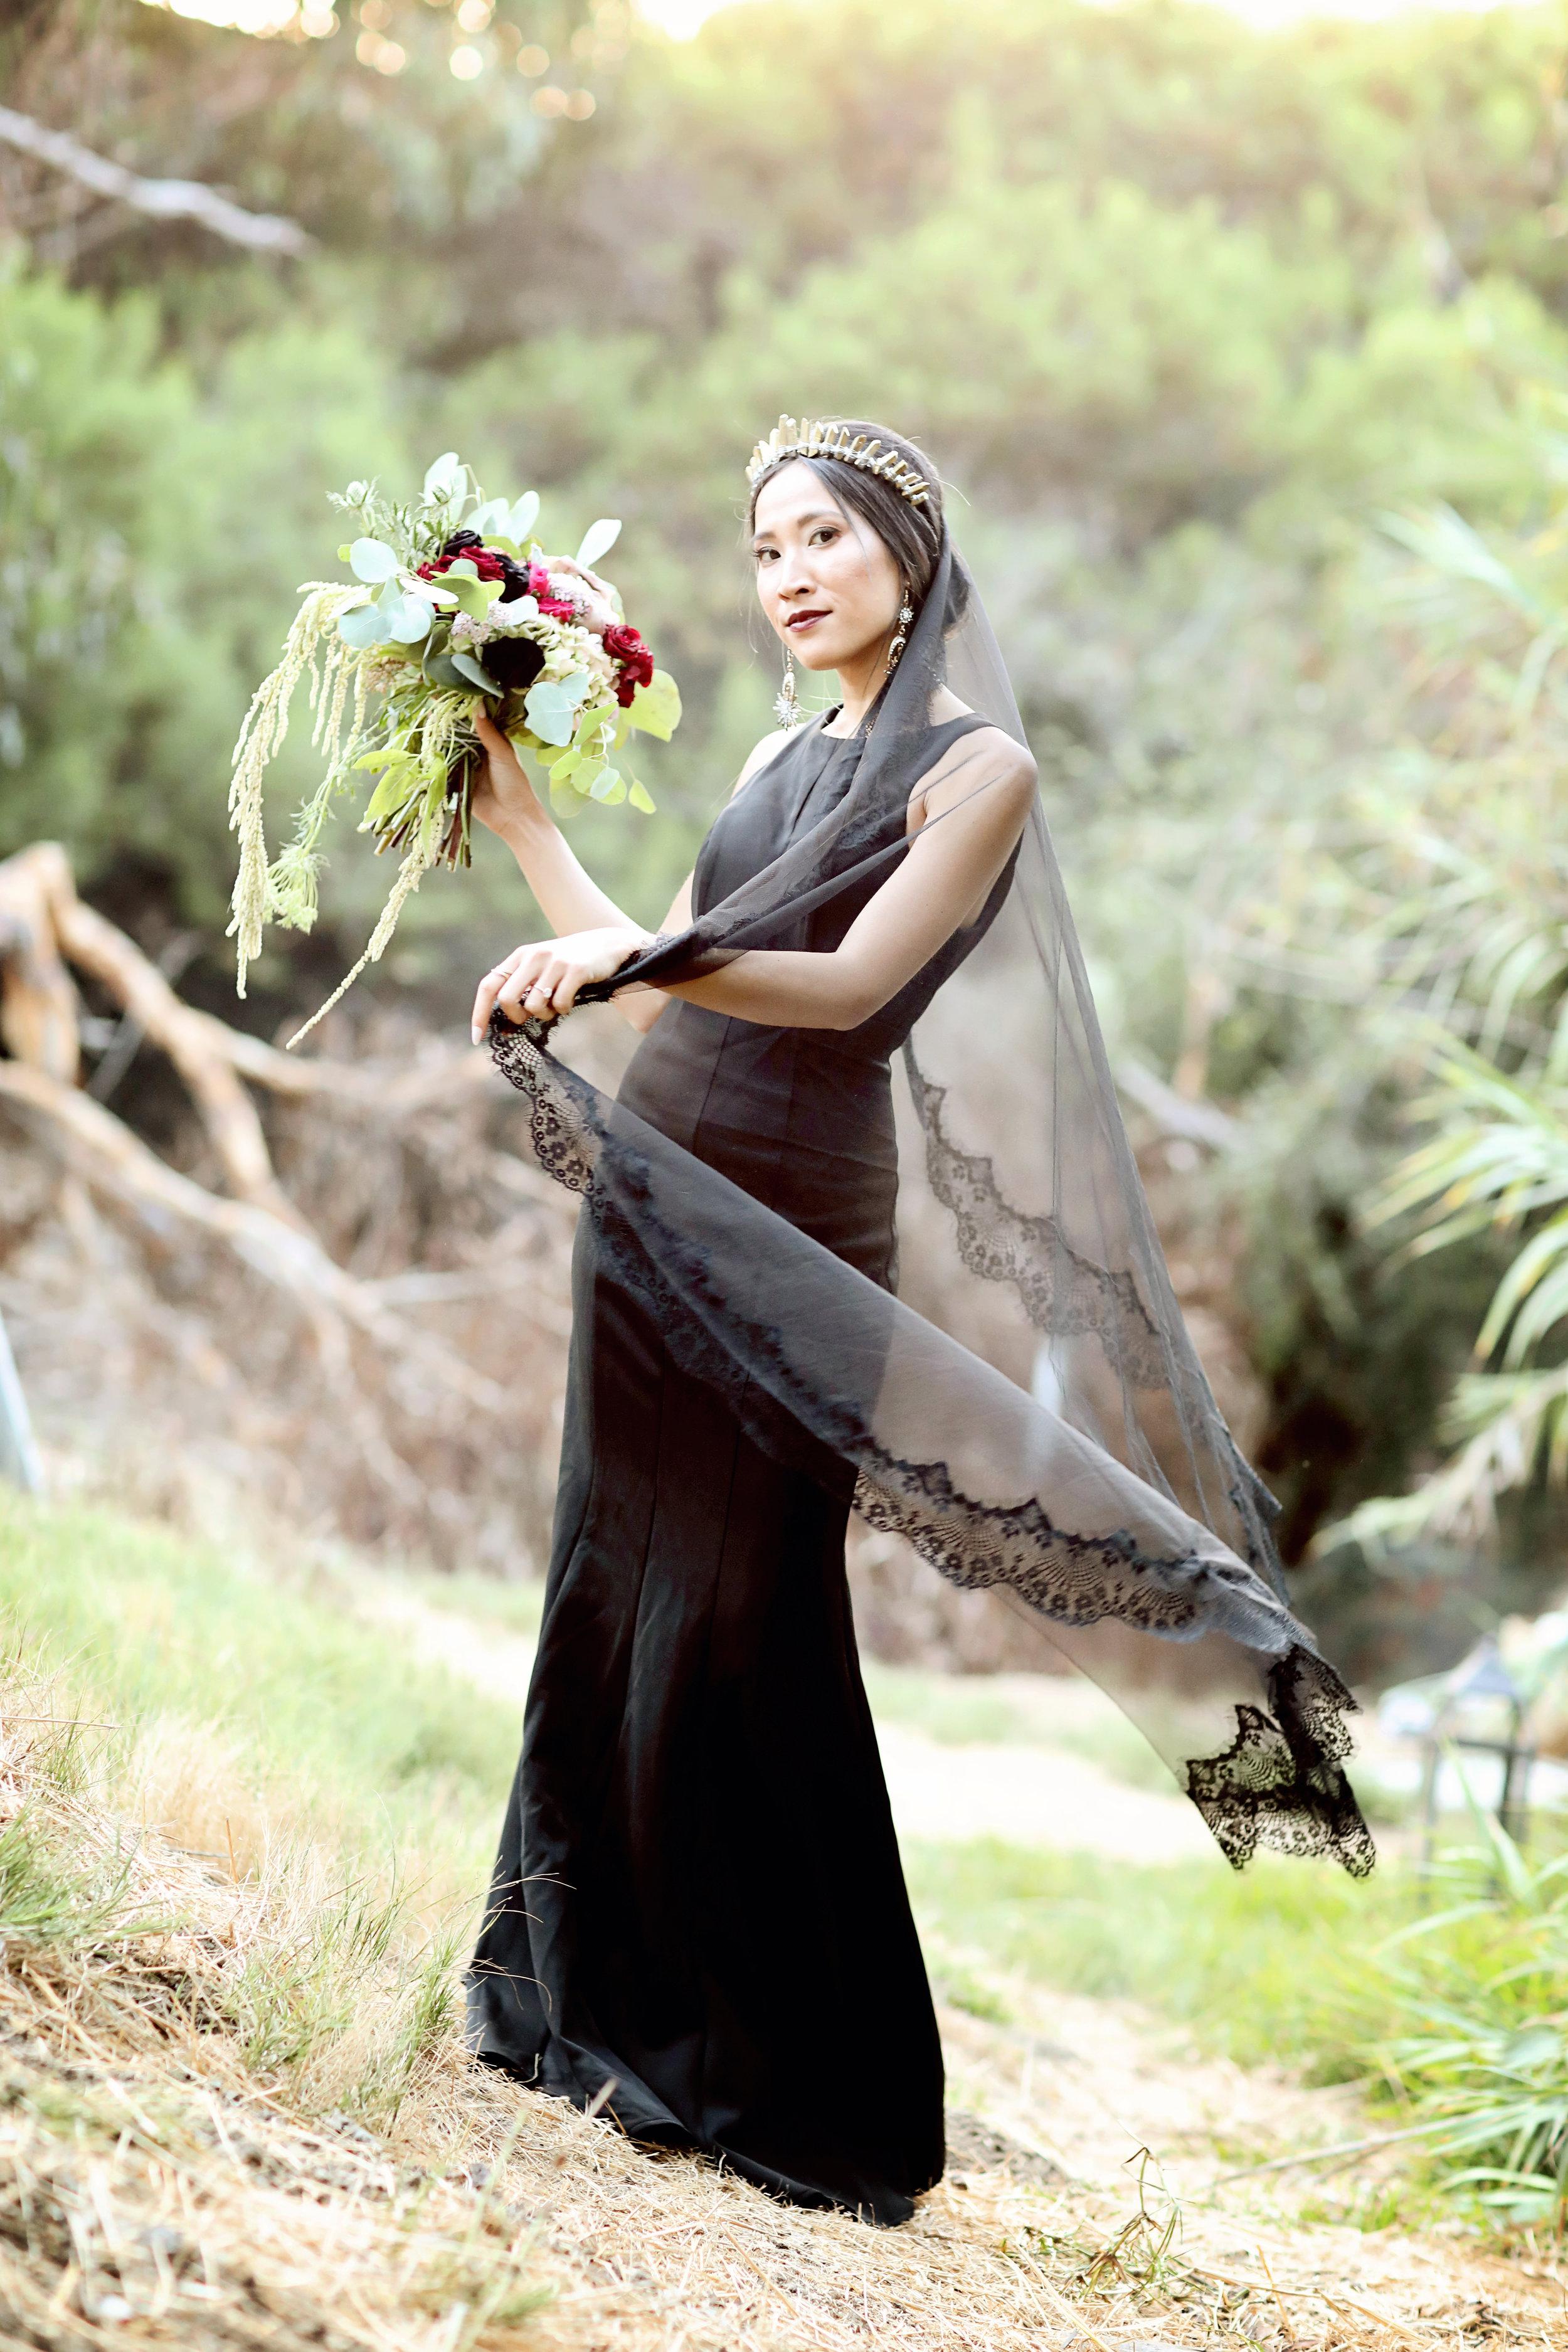 Orange County Bride wearing a black wedding dress and a black veil.